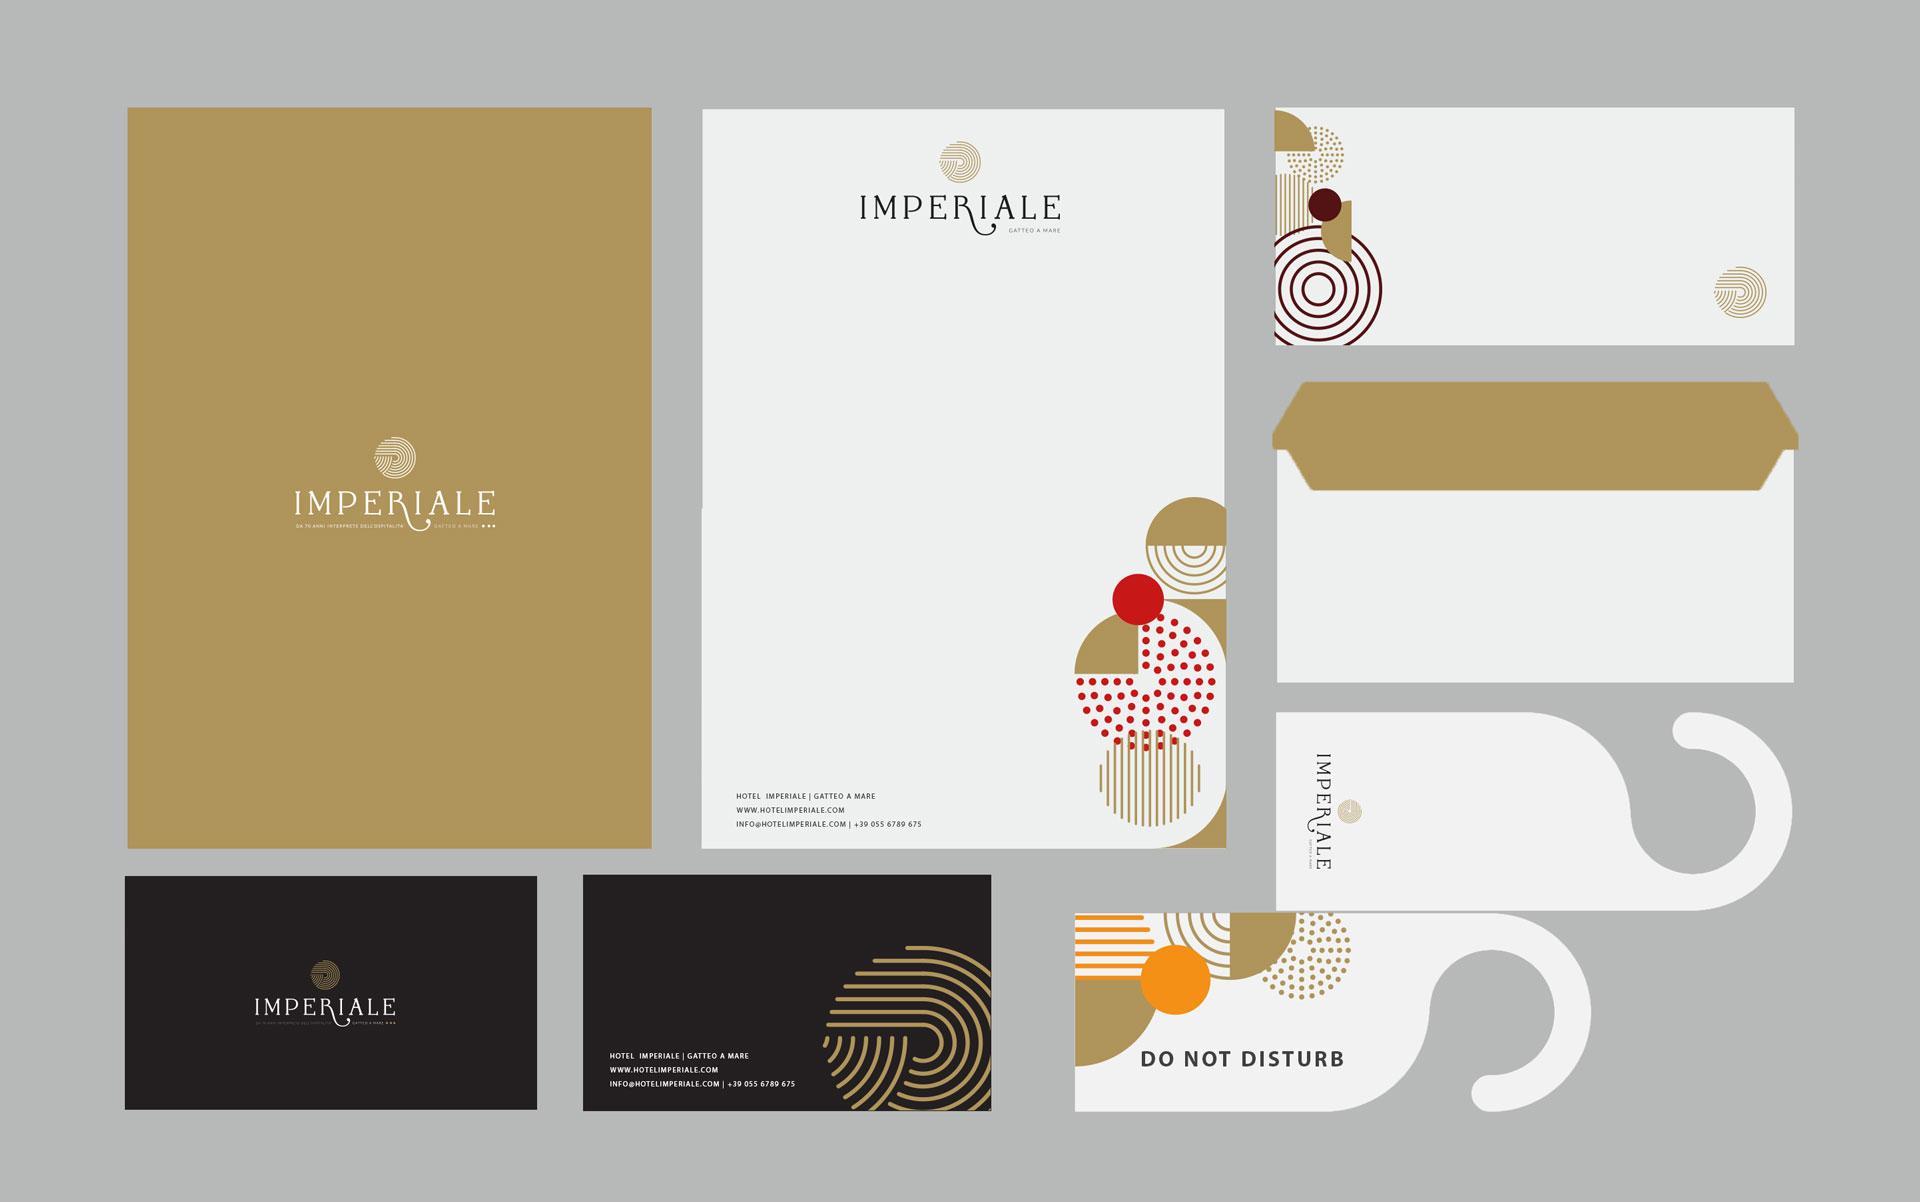 brand_identity_imperiale